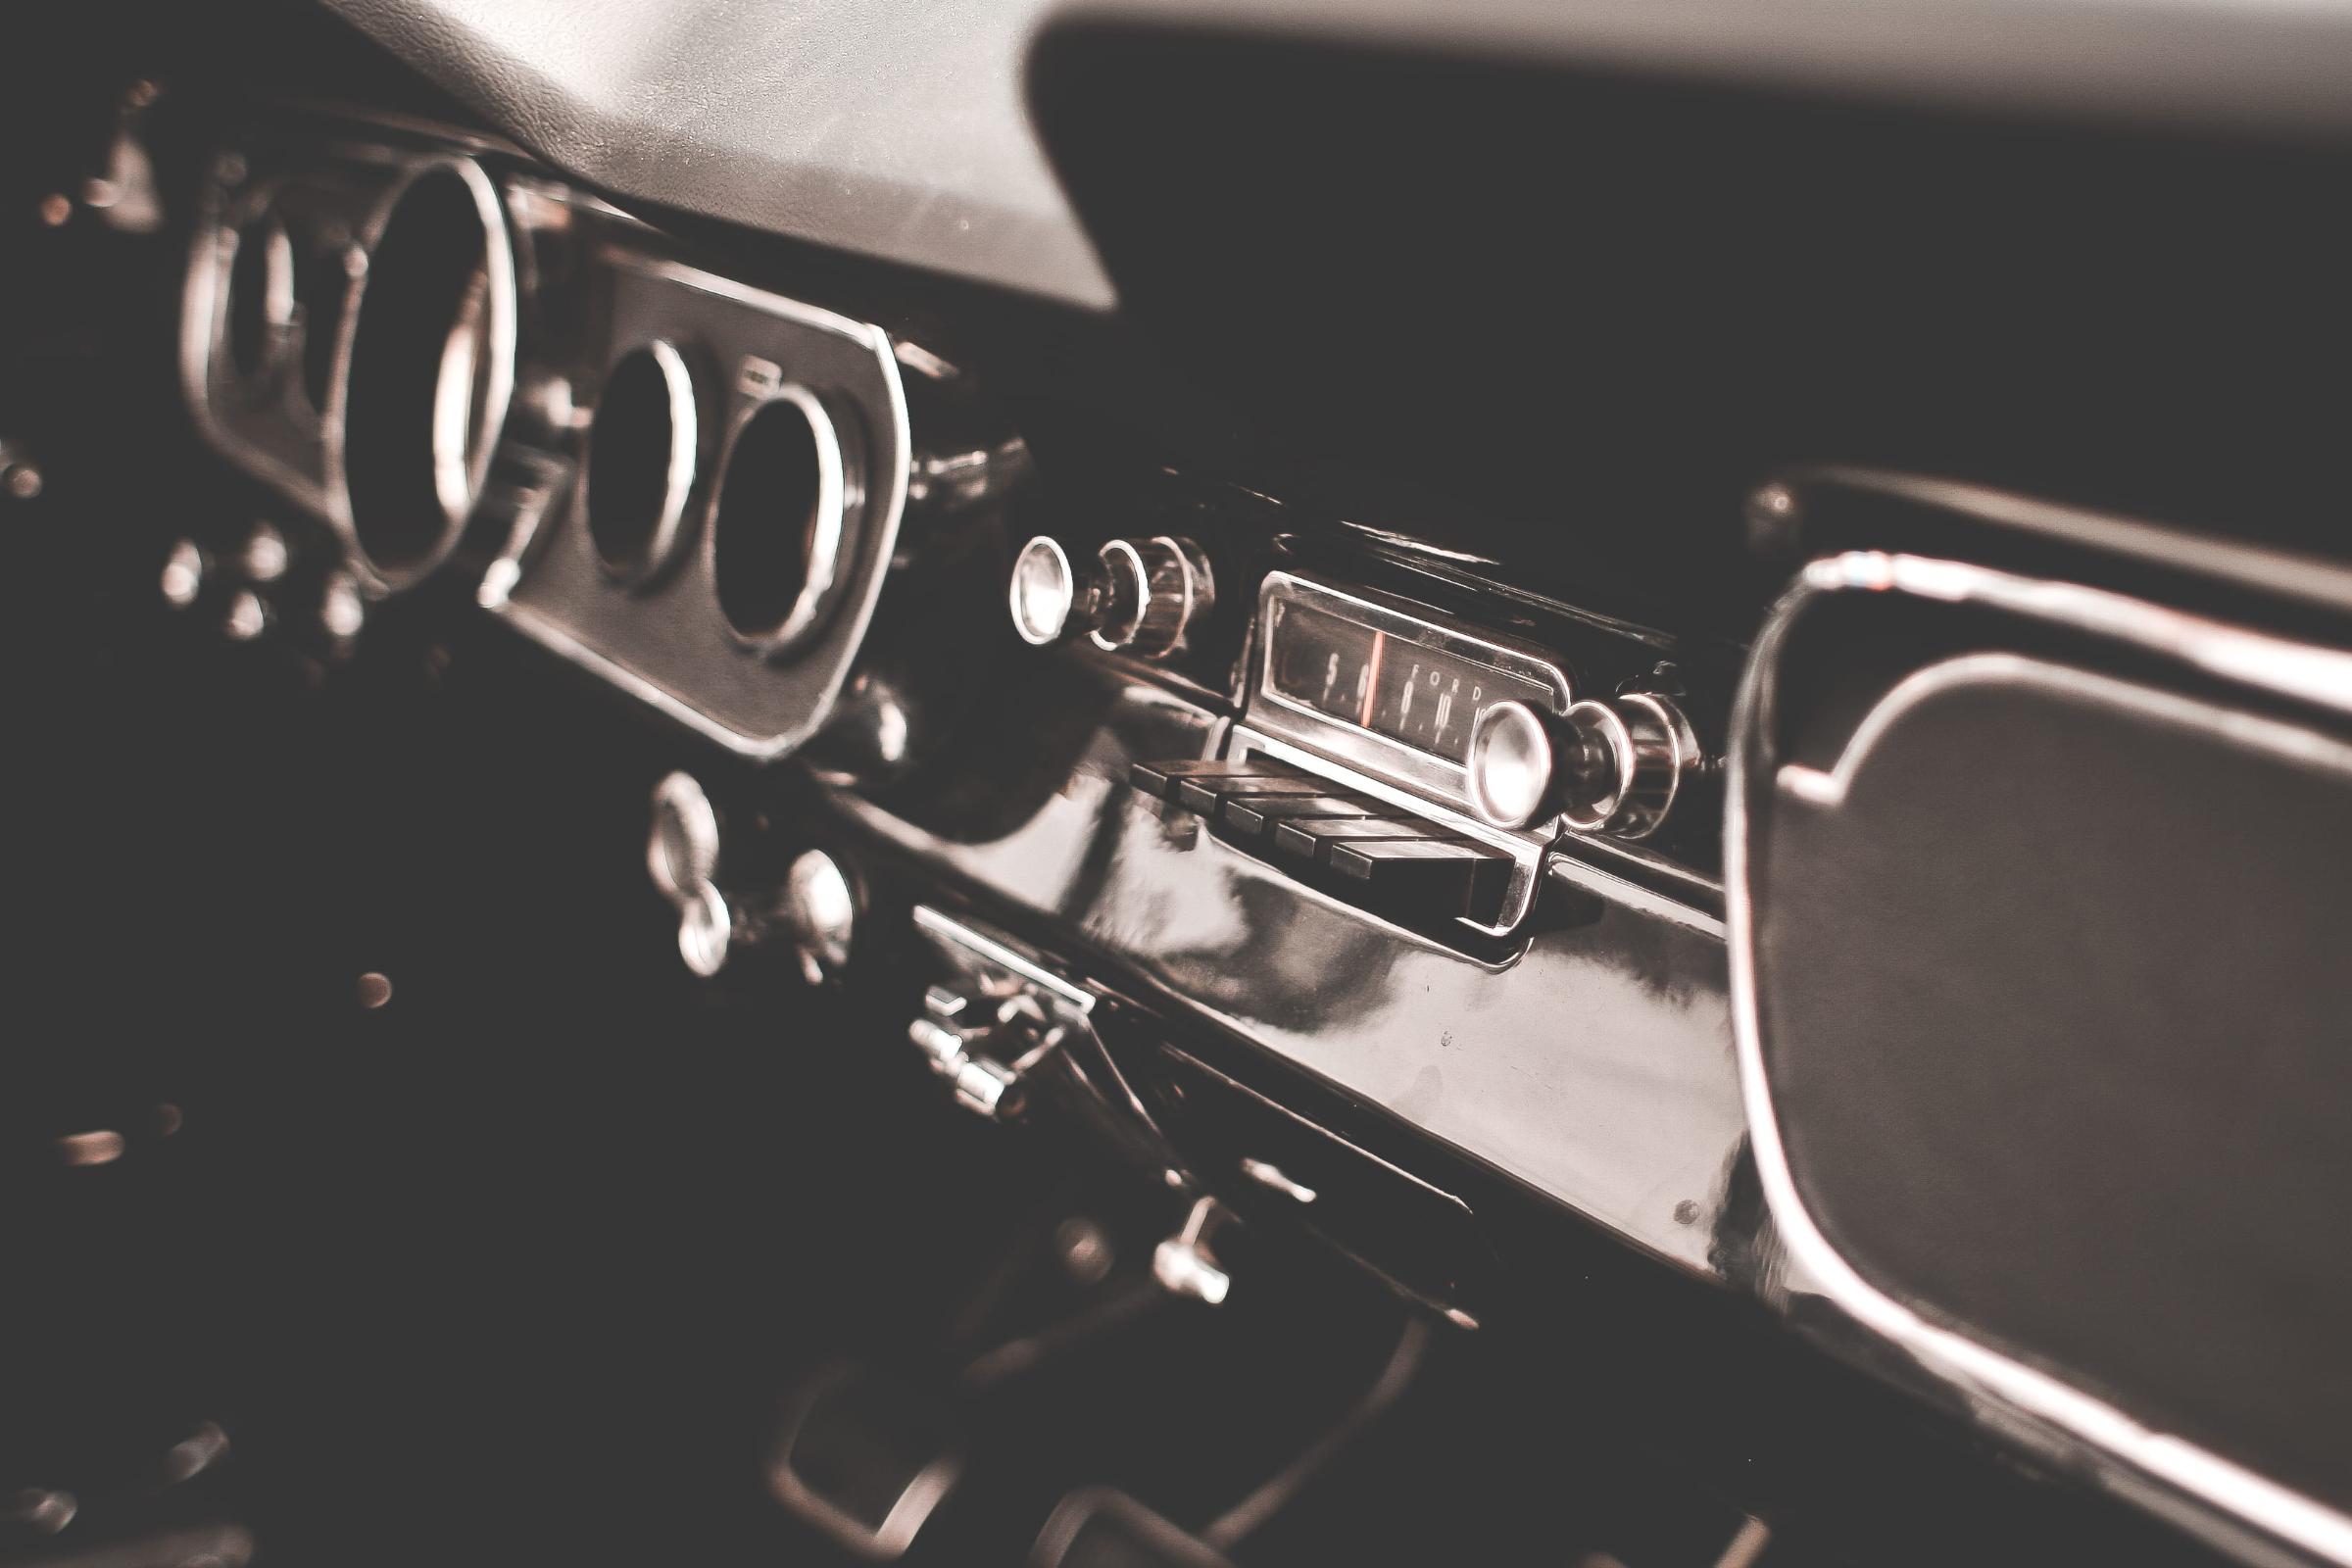 Old music radio